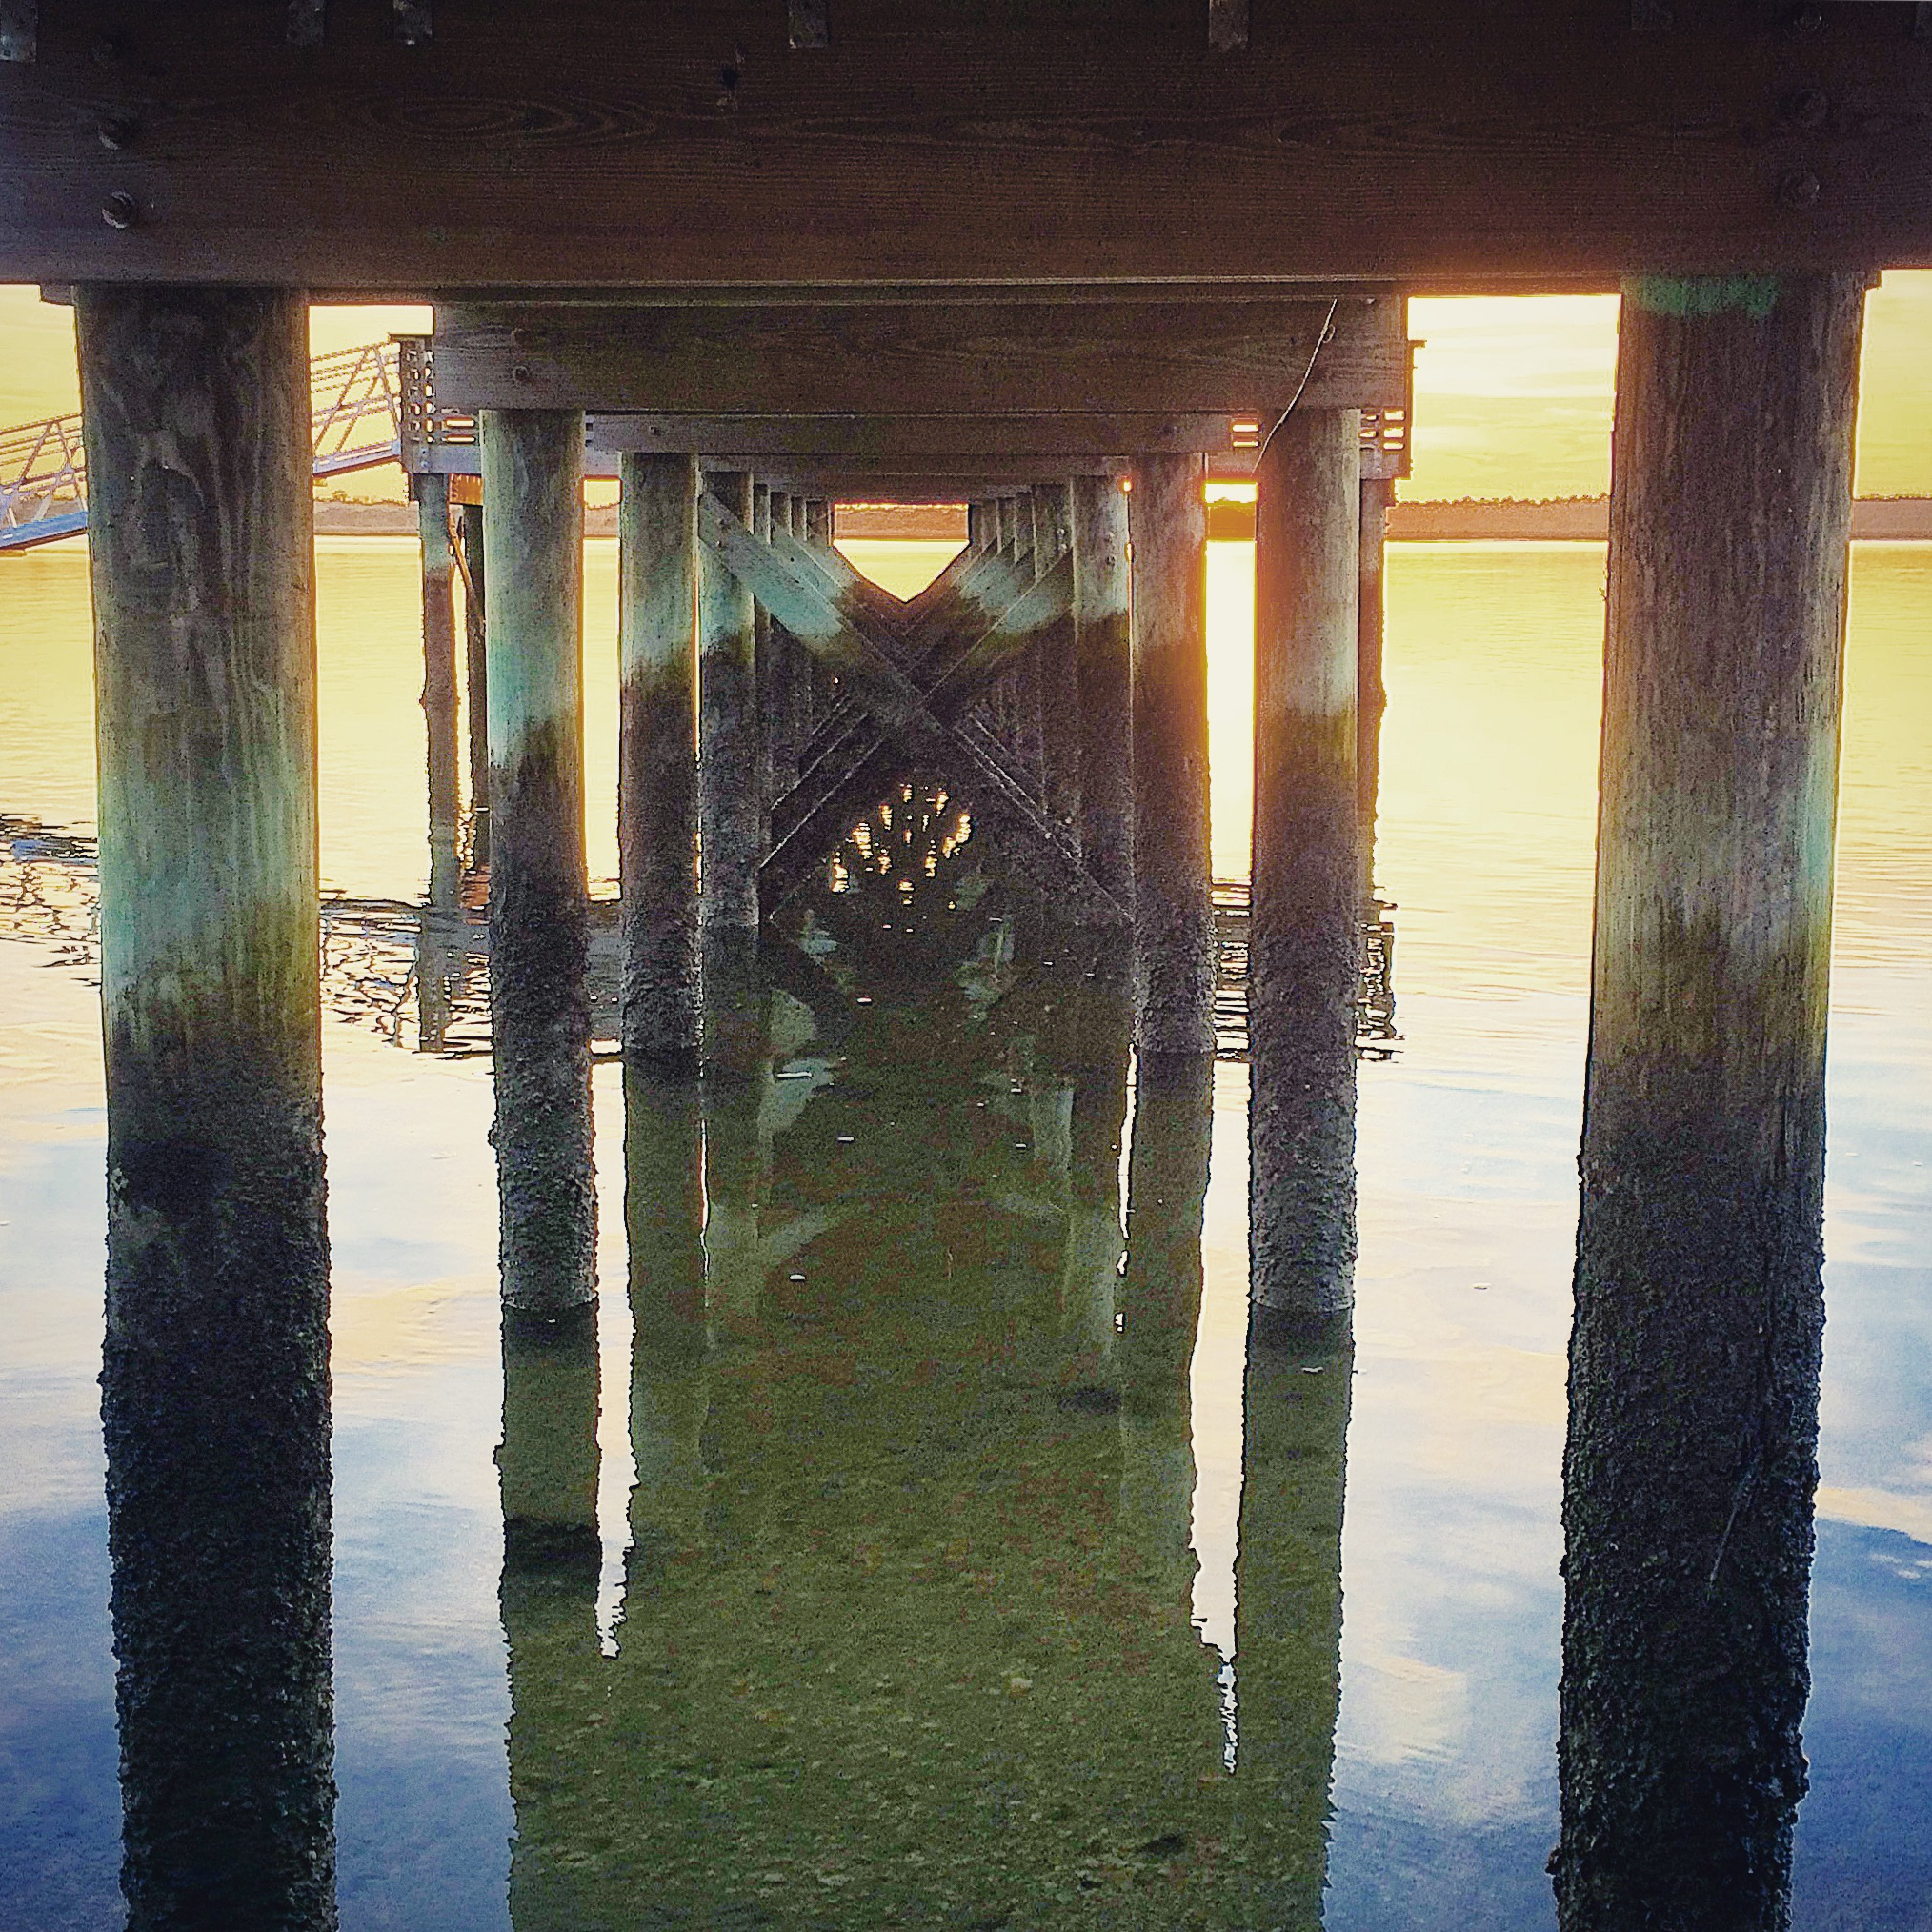 Underneath a pier